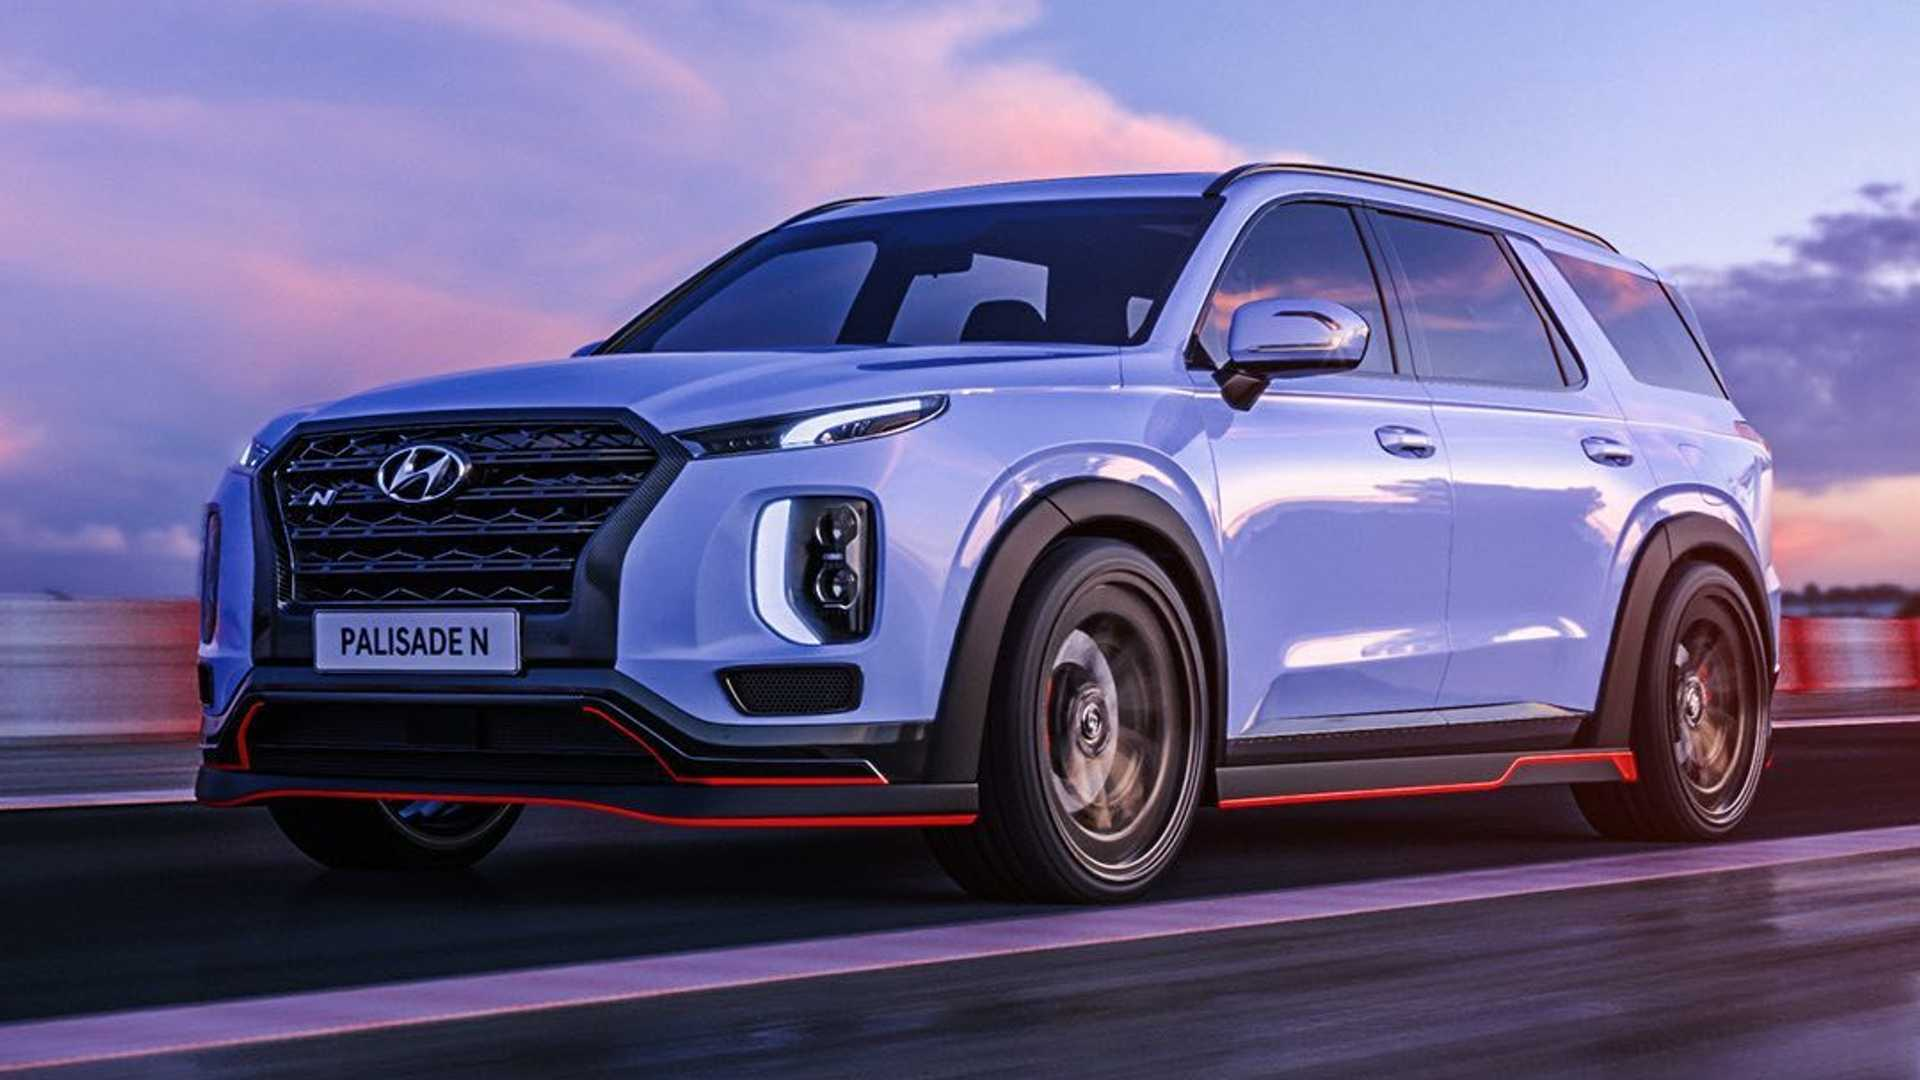 The April Fool's Joke That Needs To Exist? Hyundai Teasing A Palisade N Seems Like A Good Idea